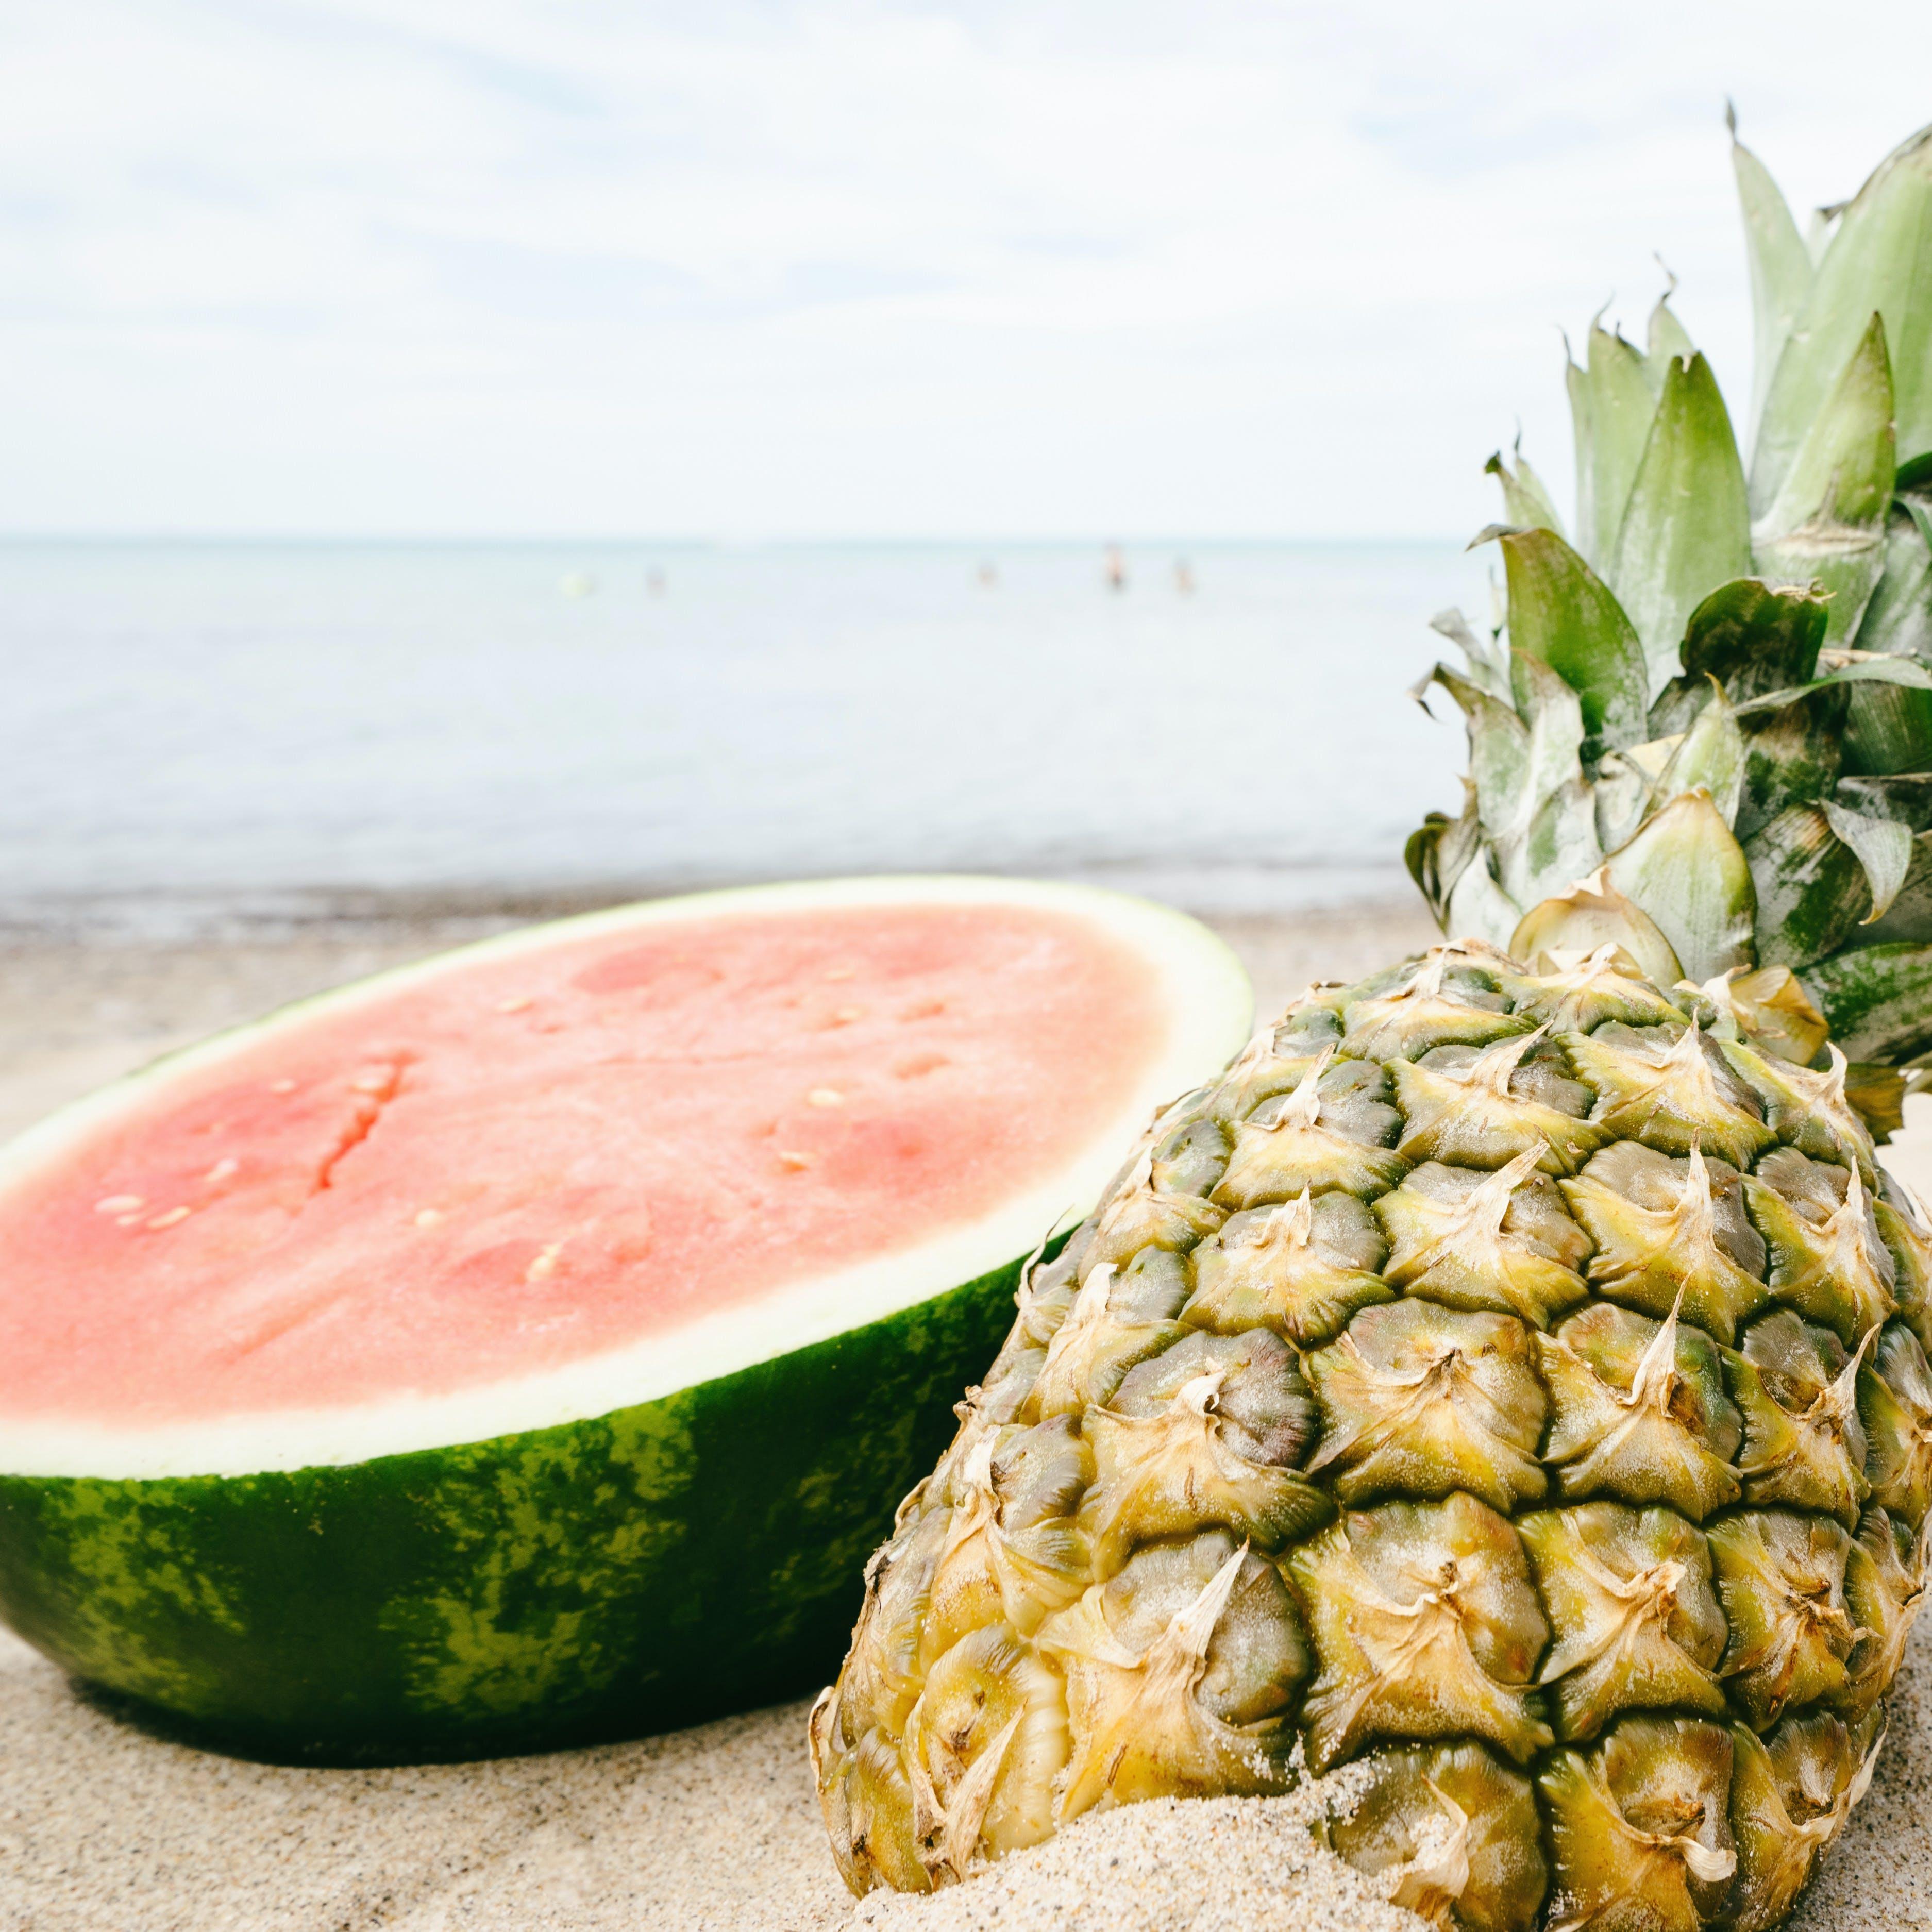 Sliced Watermelon and Pineapple Near Seashore